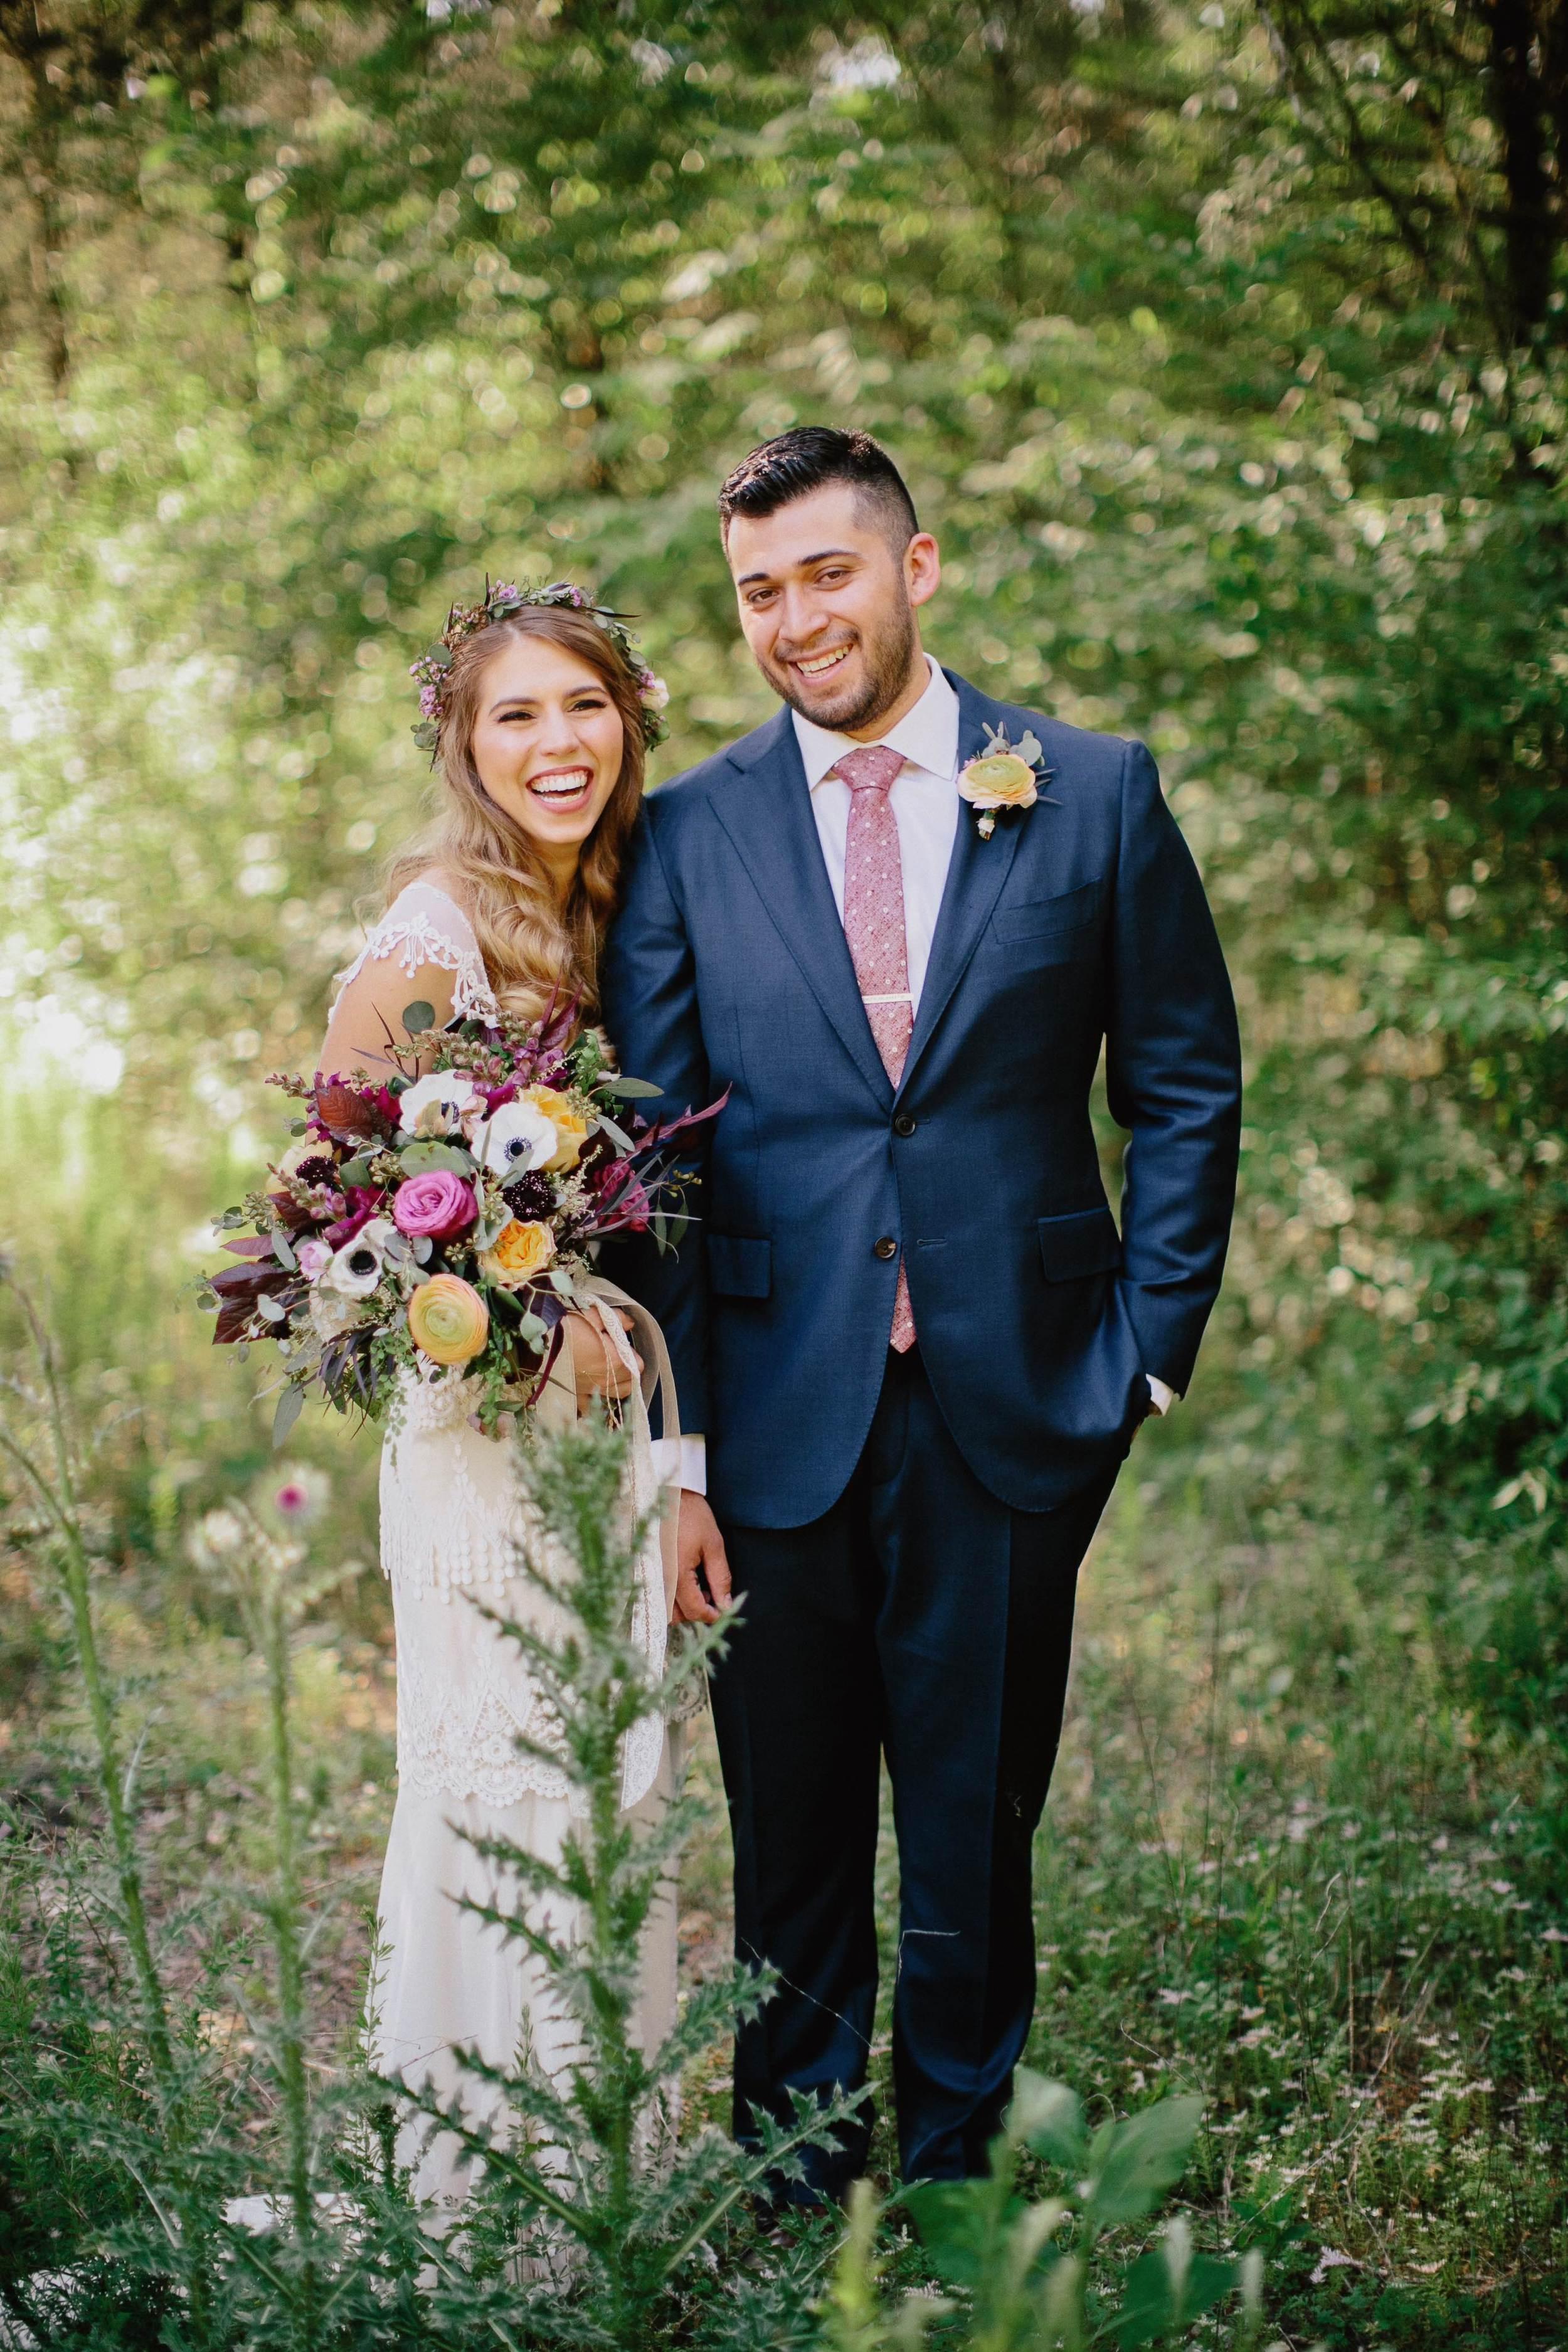 Bohemian Fiesta Wedding Inspiration // Lavender, peach, and maroon florals